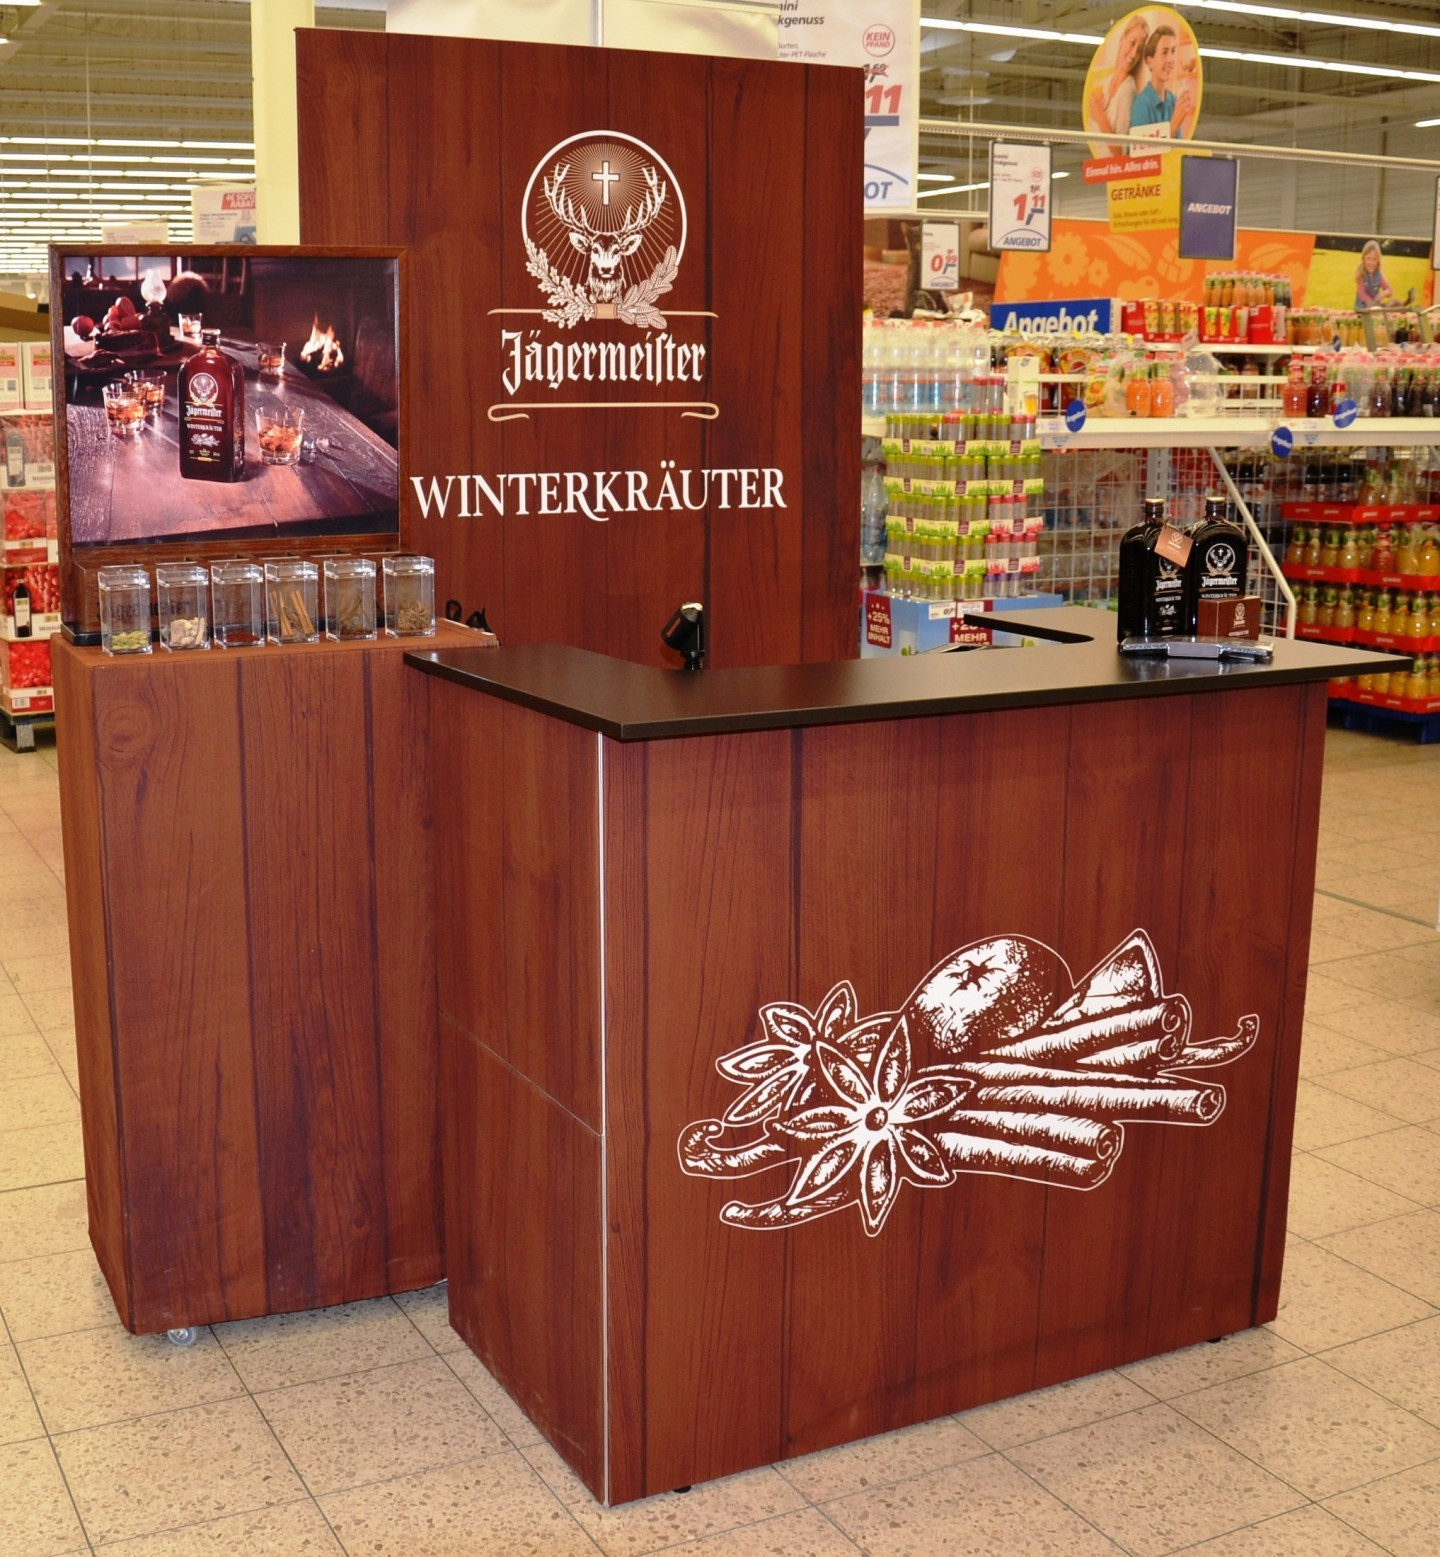 Jägermeister-Theke-im-Supermarkt-Special-Edition-Messetheke-Quickup-Falttheke-Pro